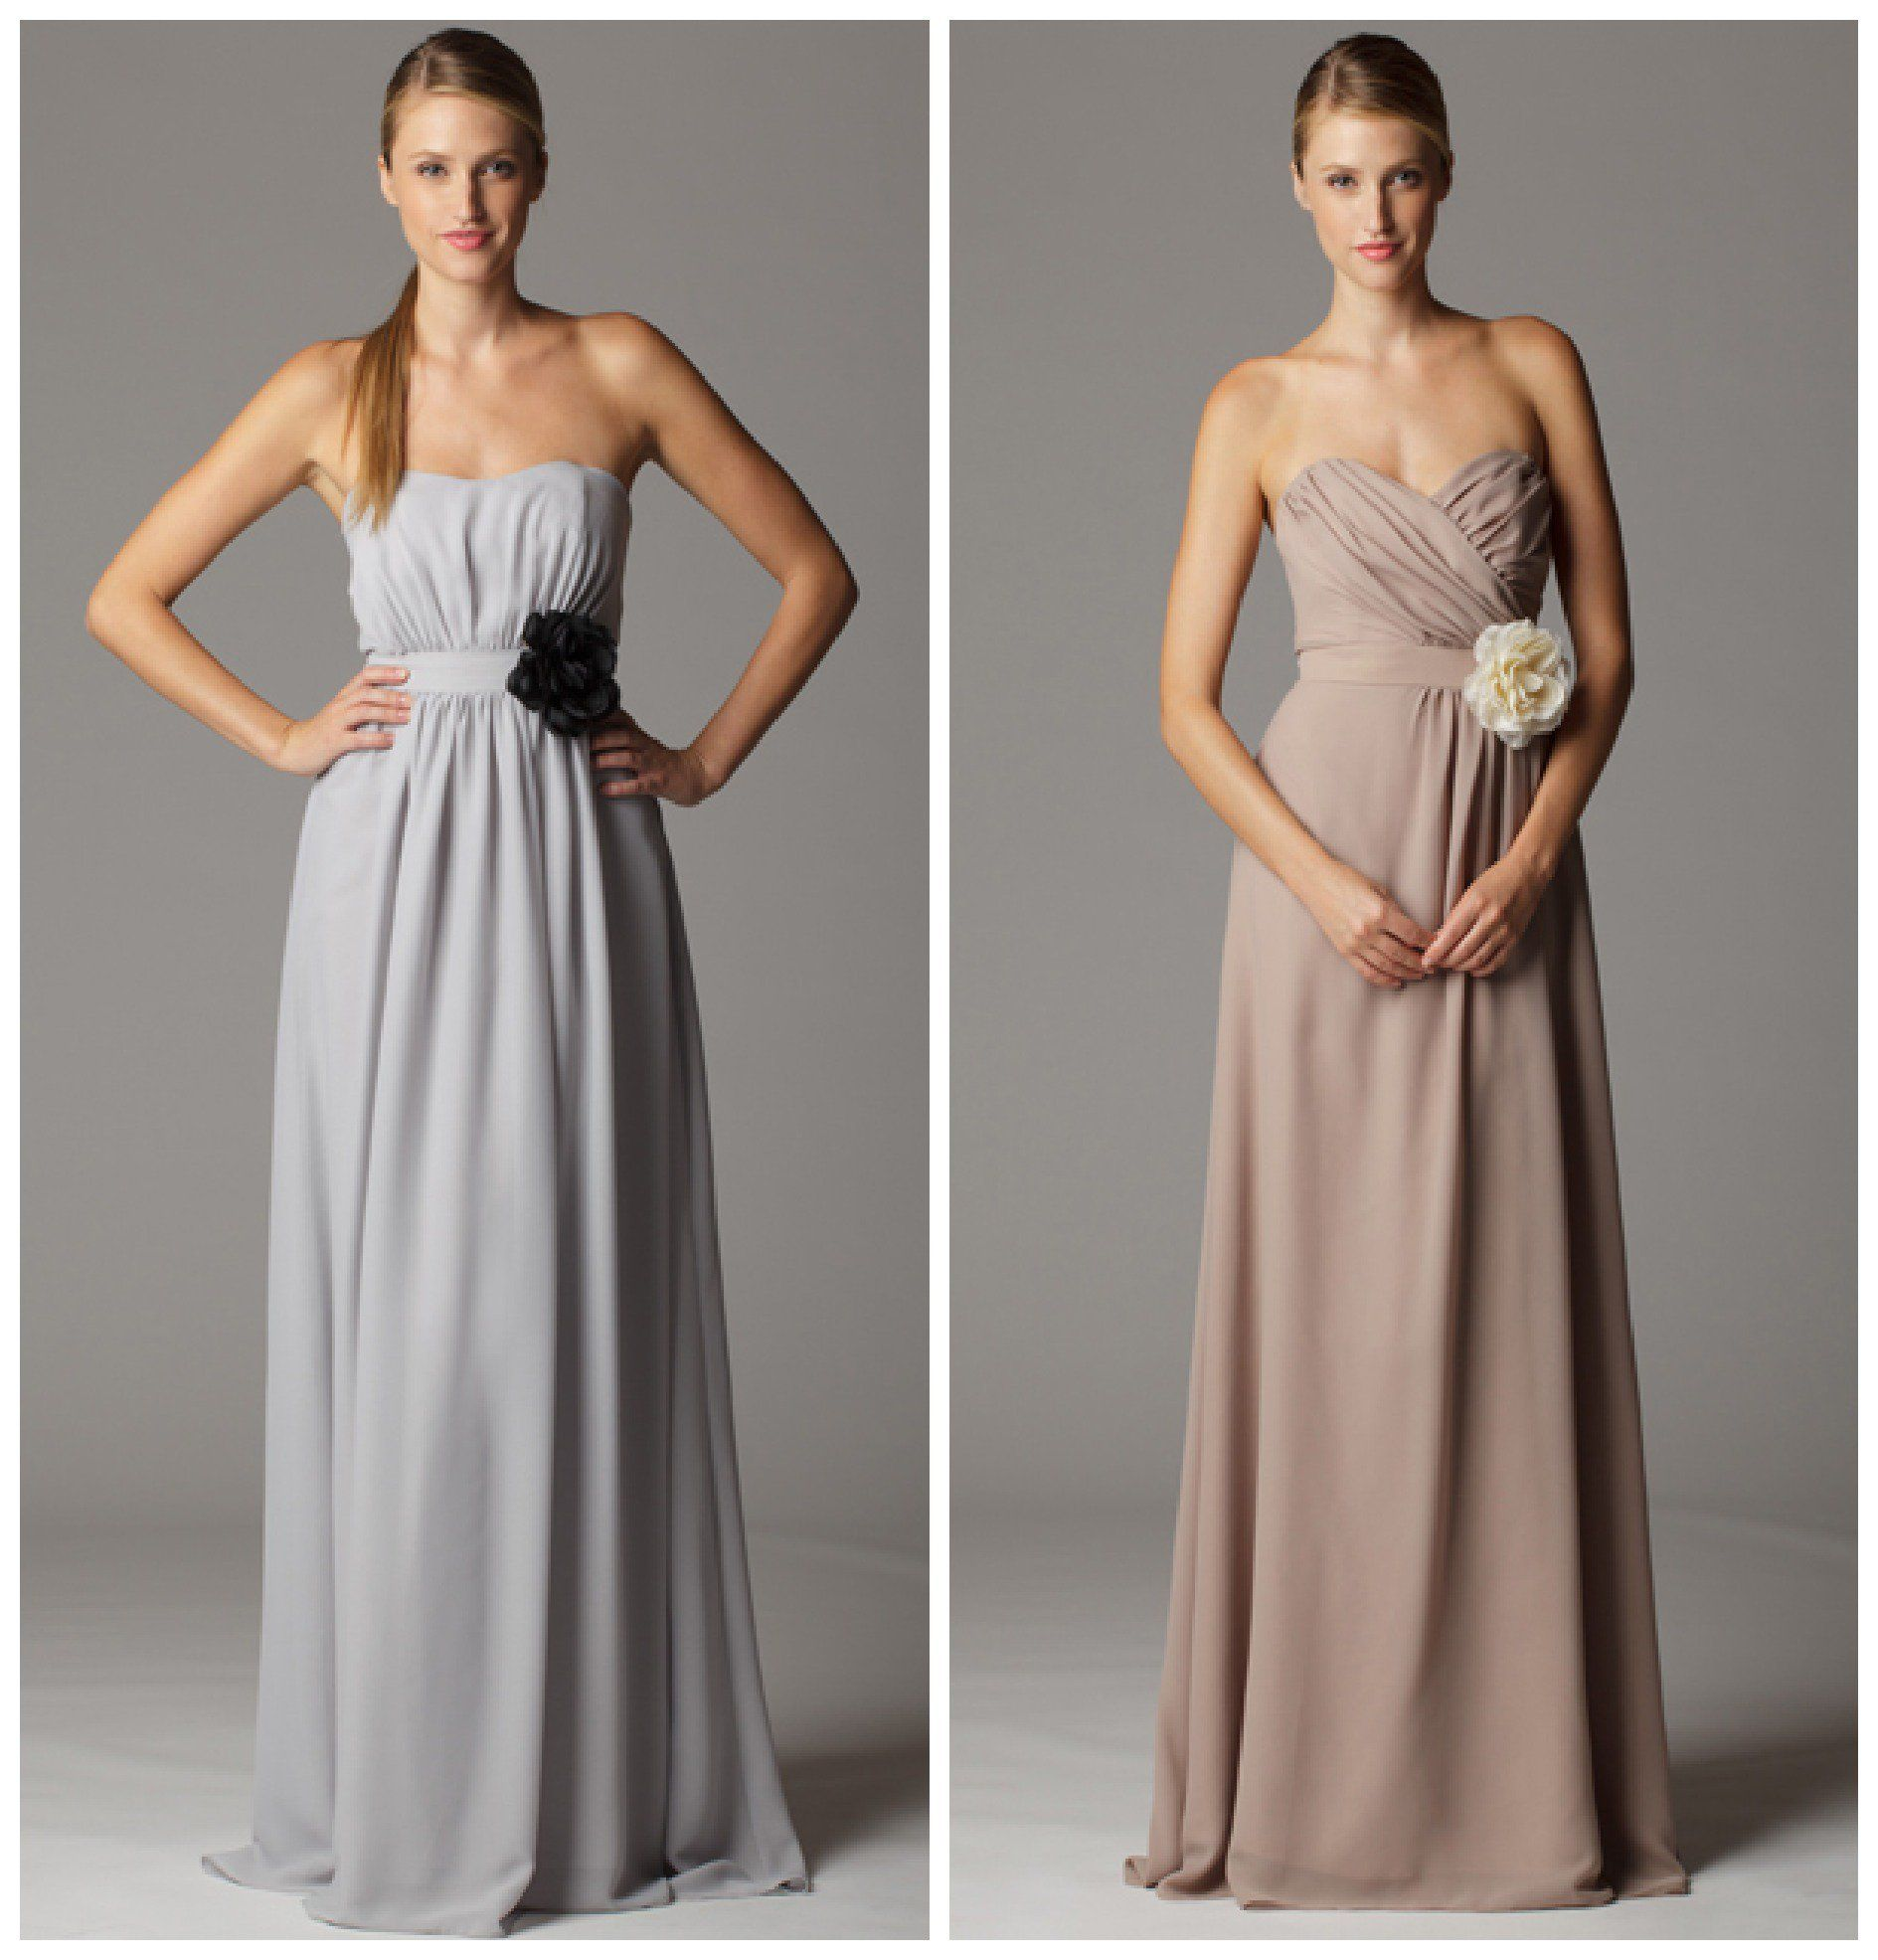 Sexy simple wedding dresses sexy dresses pinterest simple